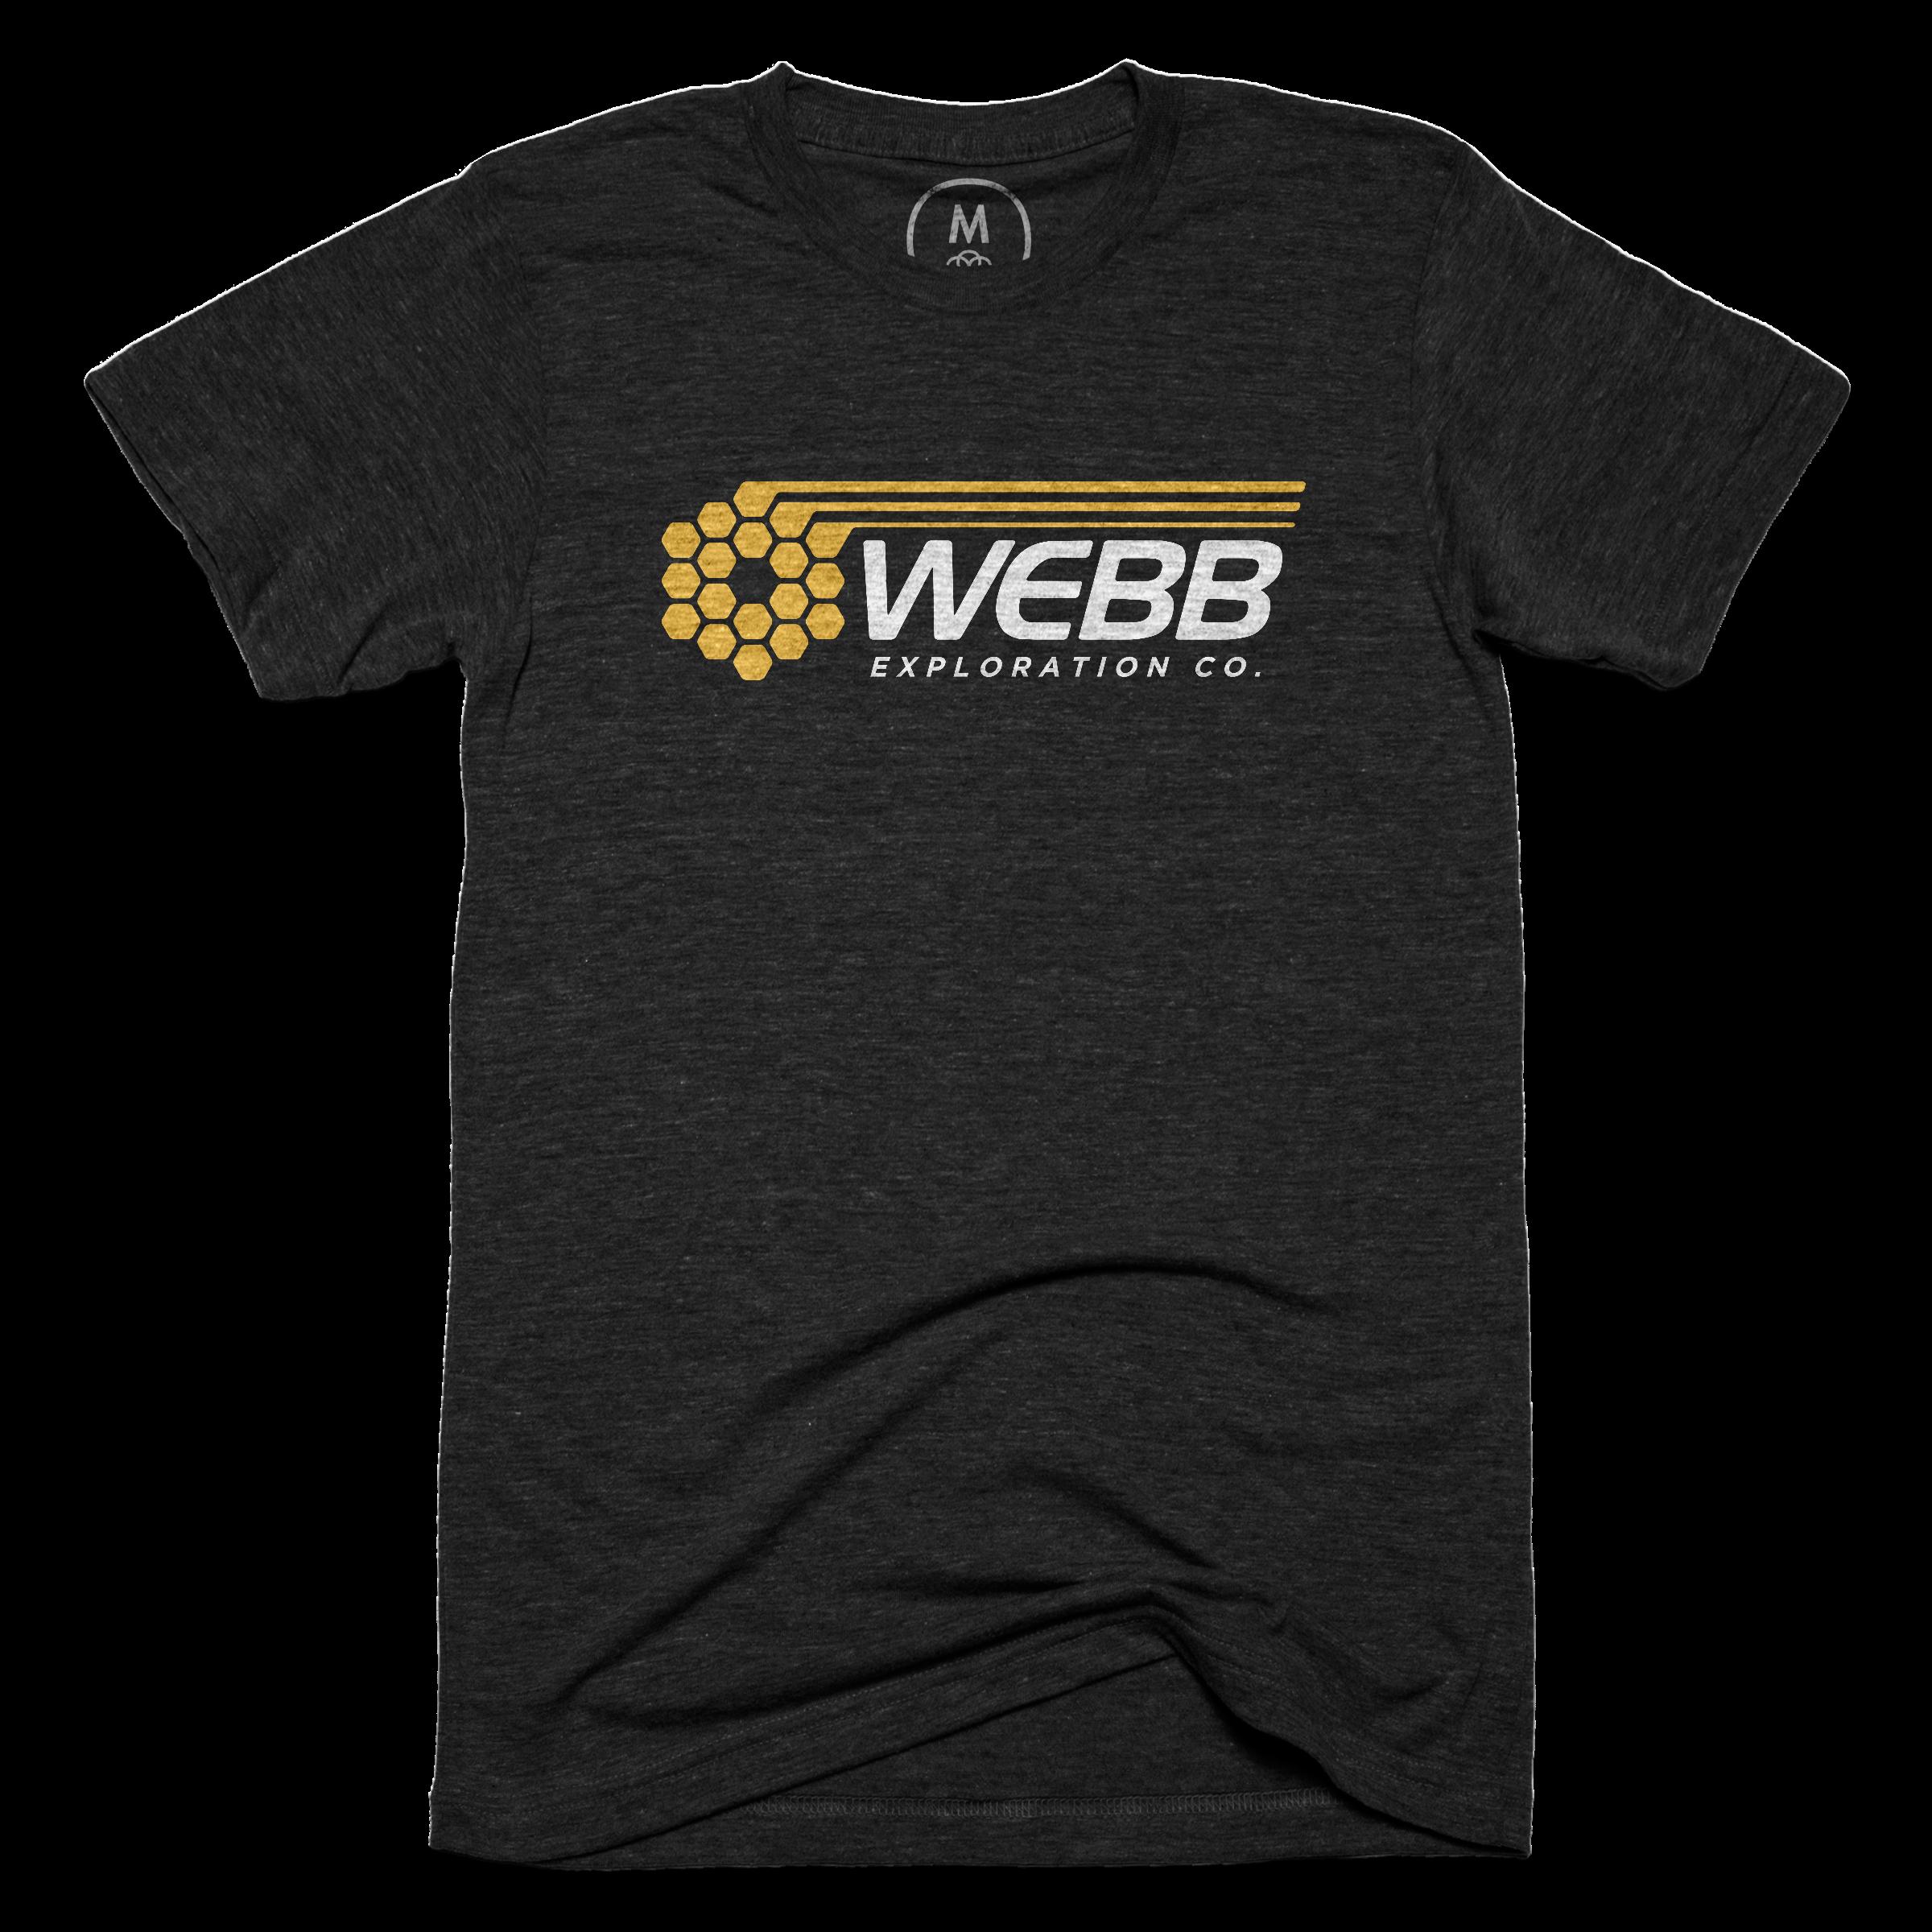 WEBB Exploration Co.